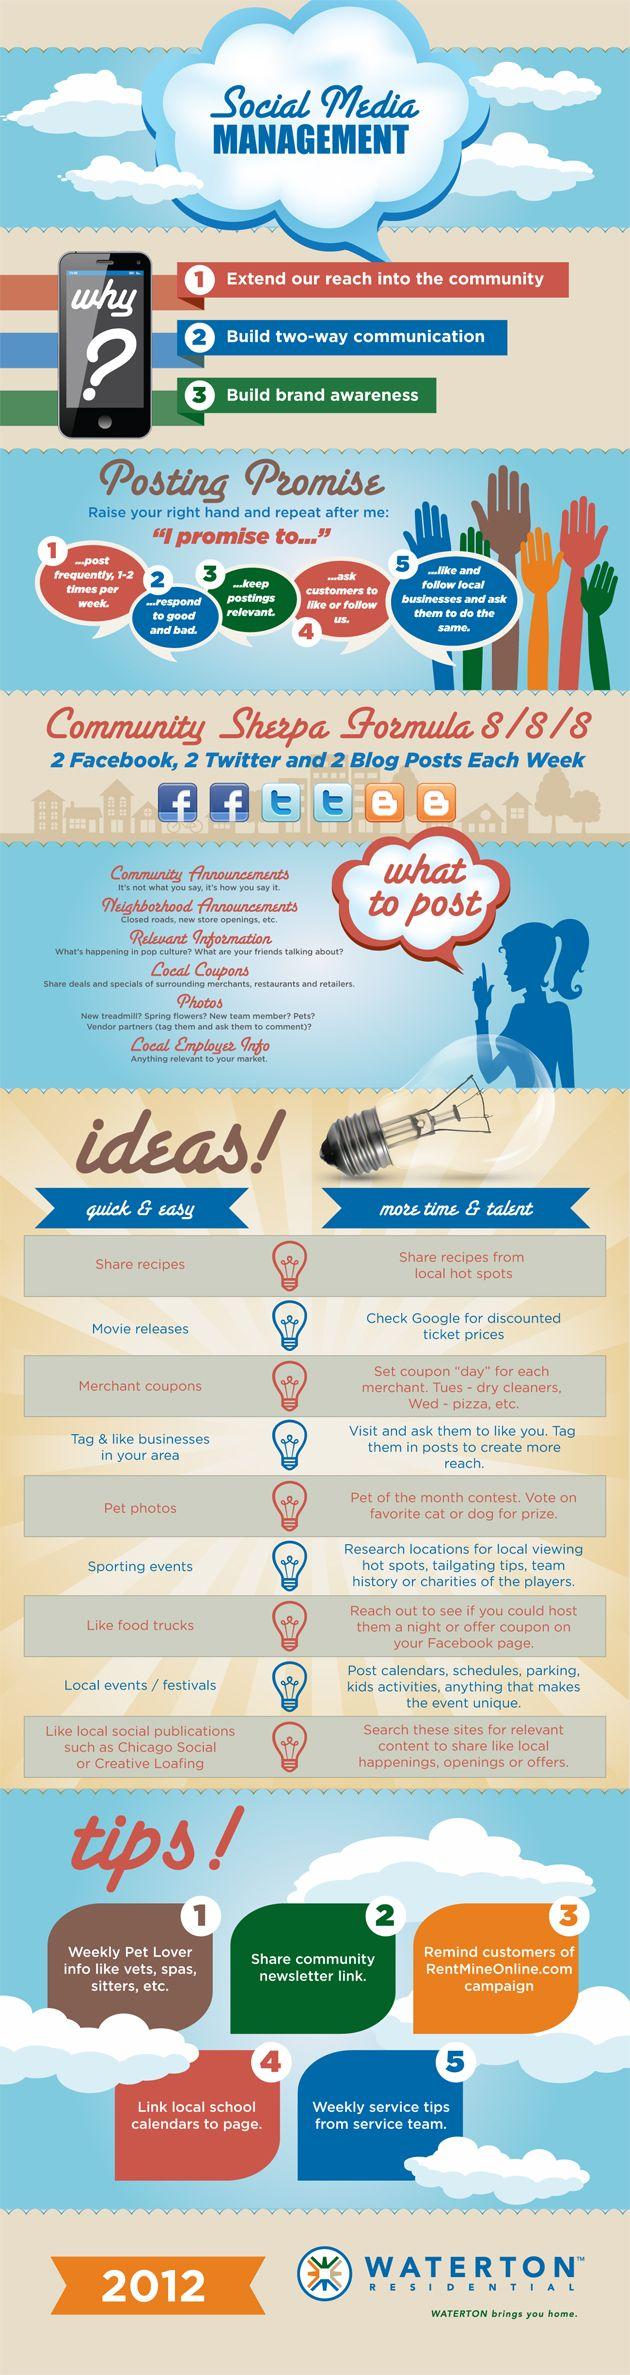 SOCIAL MEDIA - Social Media Management #sm #infographic.